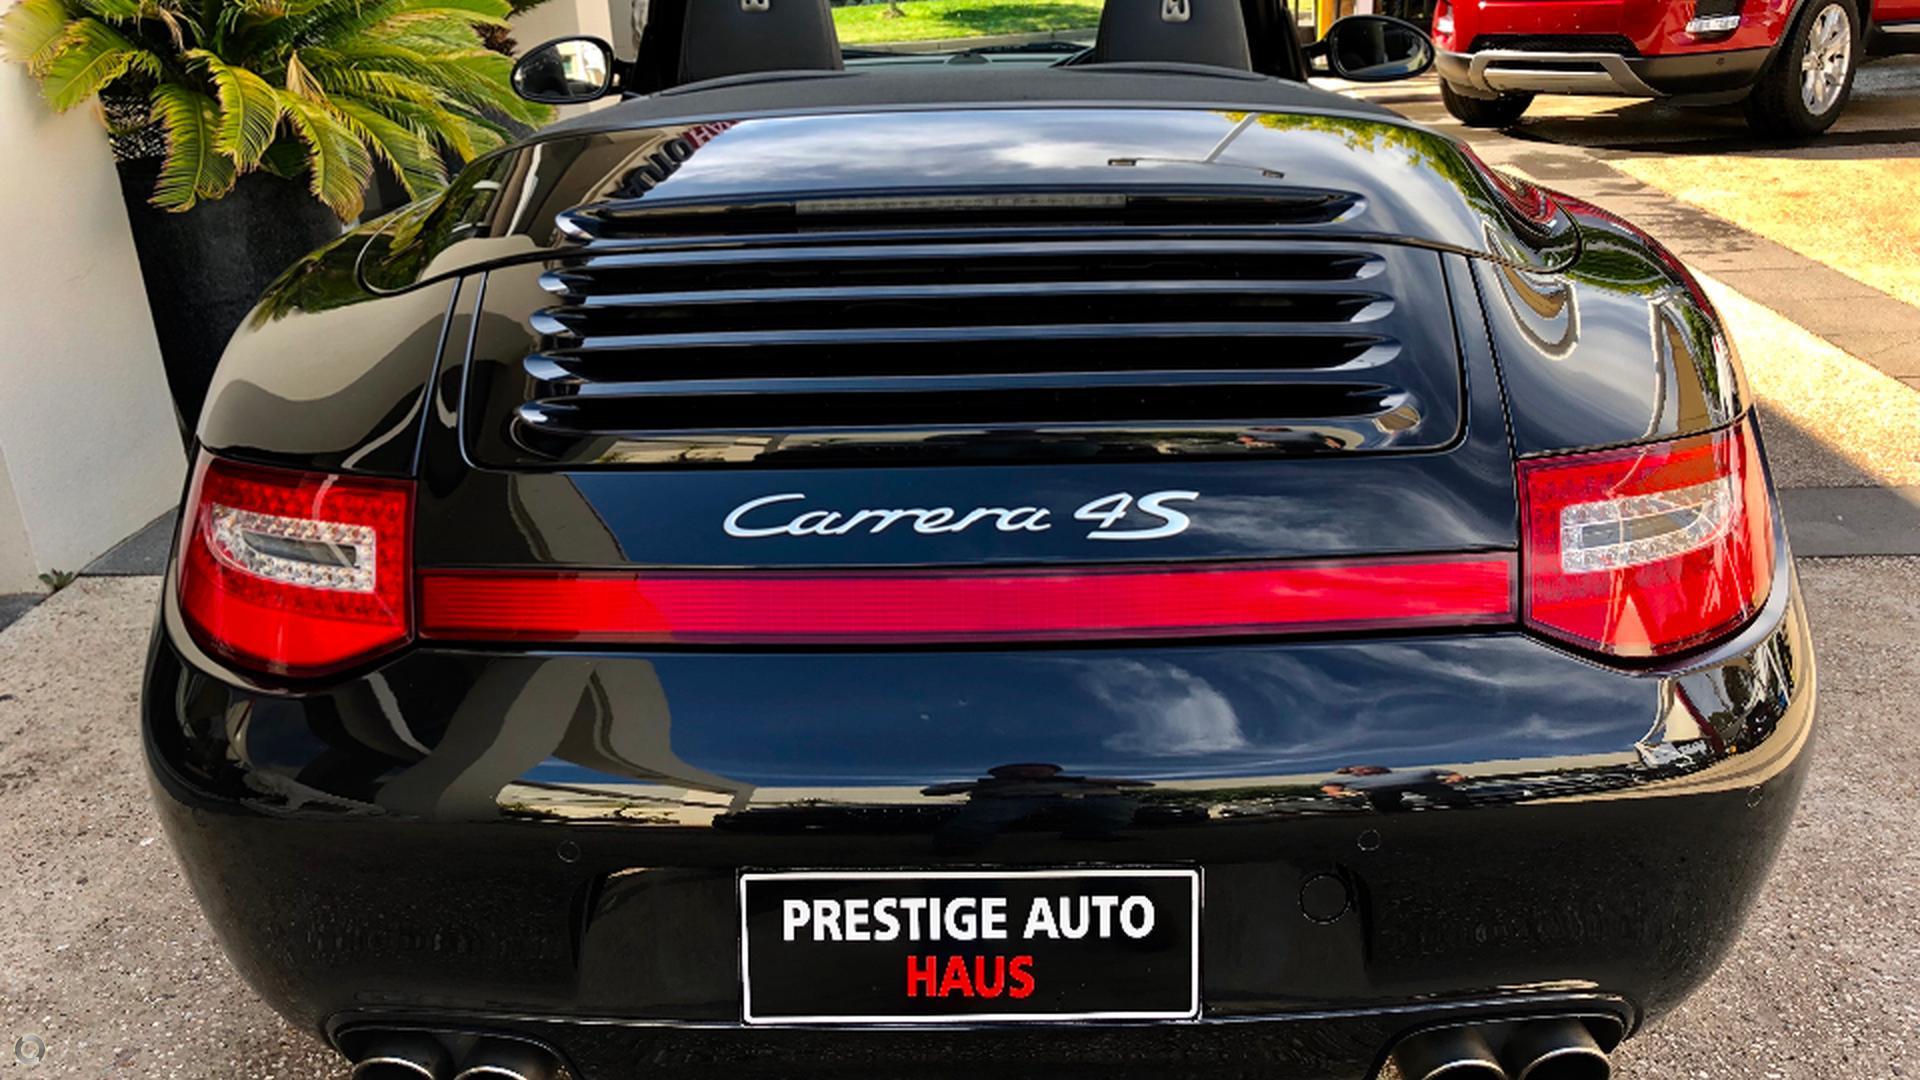 2009 Porsche 911 Carrera 4S 997 Series II